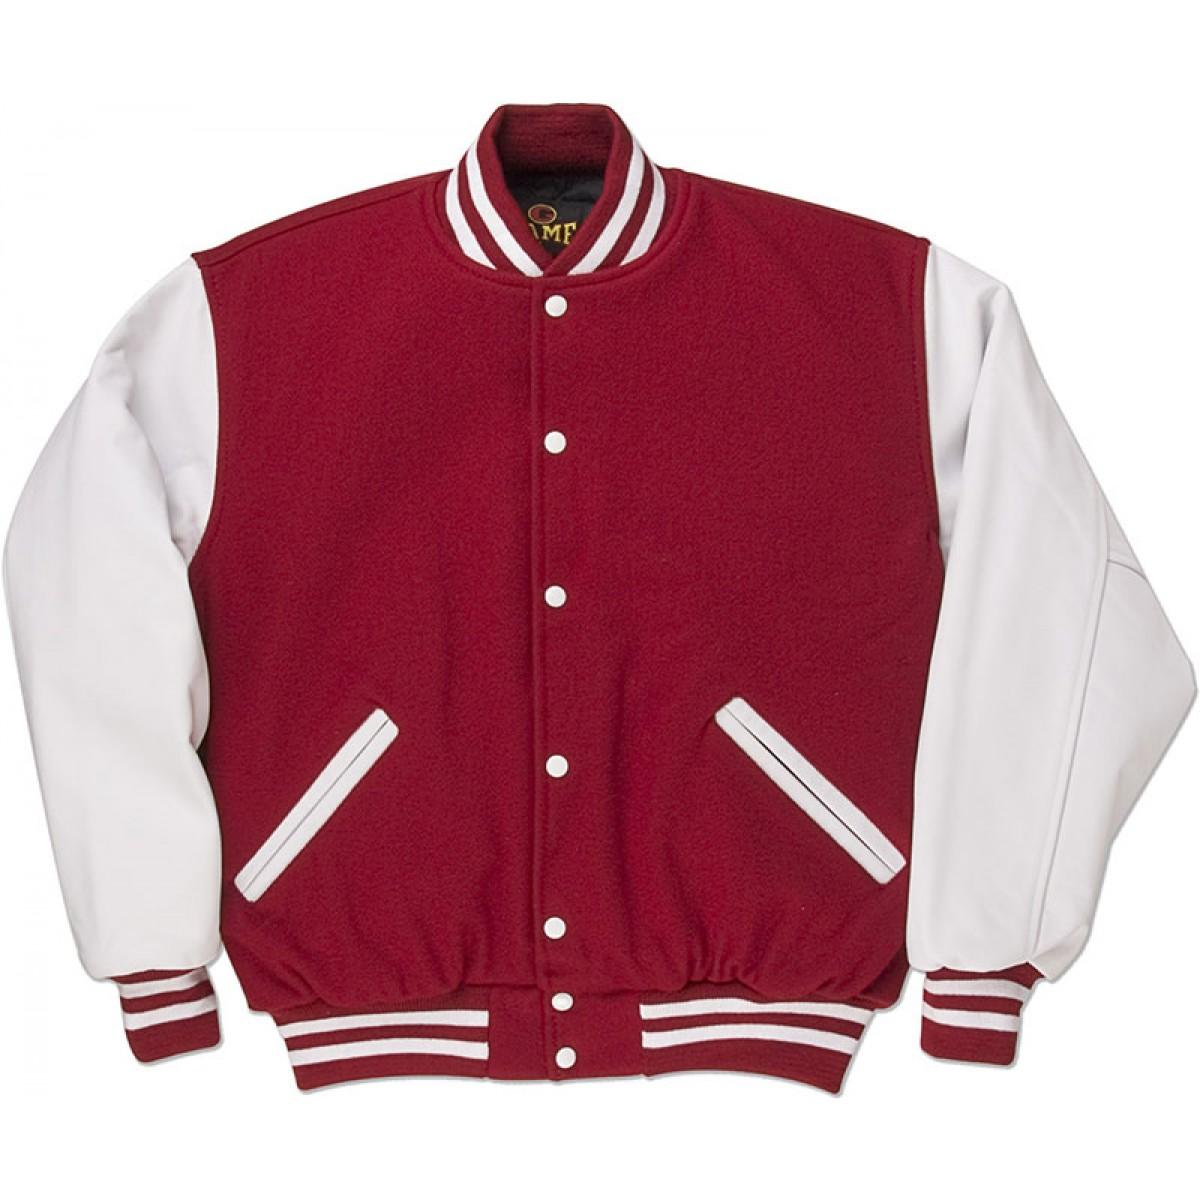 Letterman jackets: put on properly to look stylish